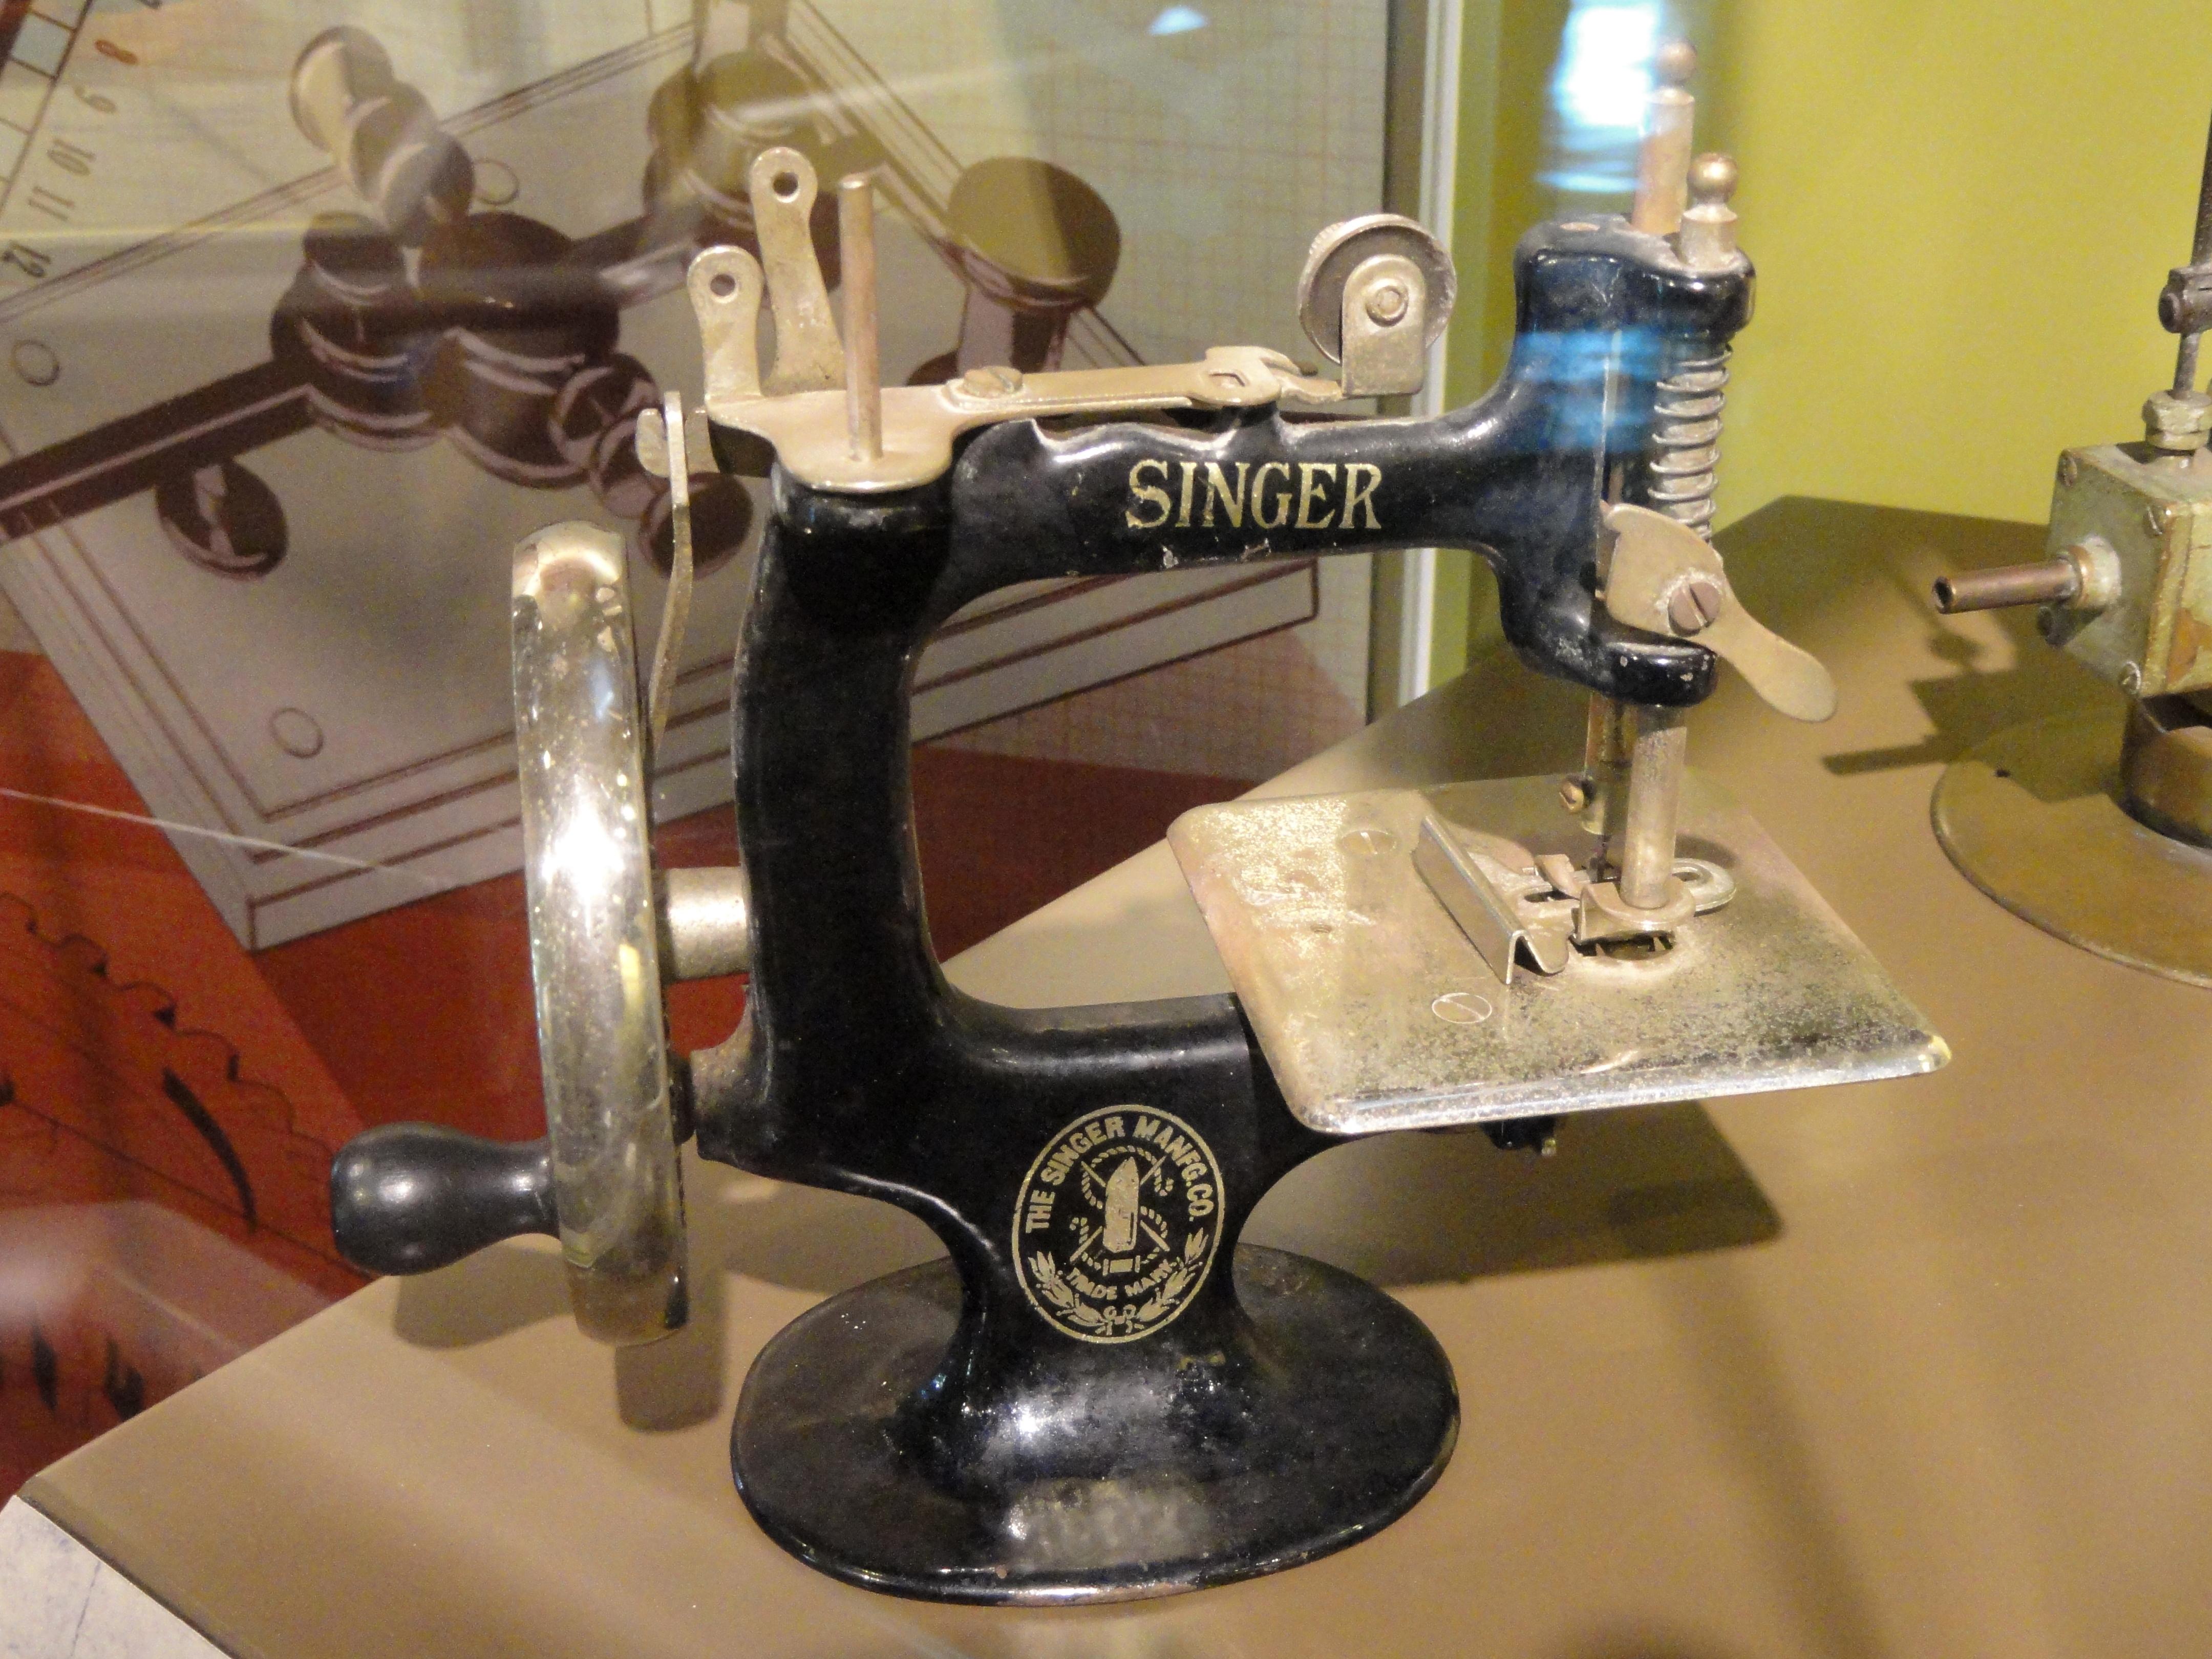 File:Singer Sewing Machine toy, Singer Manufacturing Co